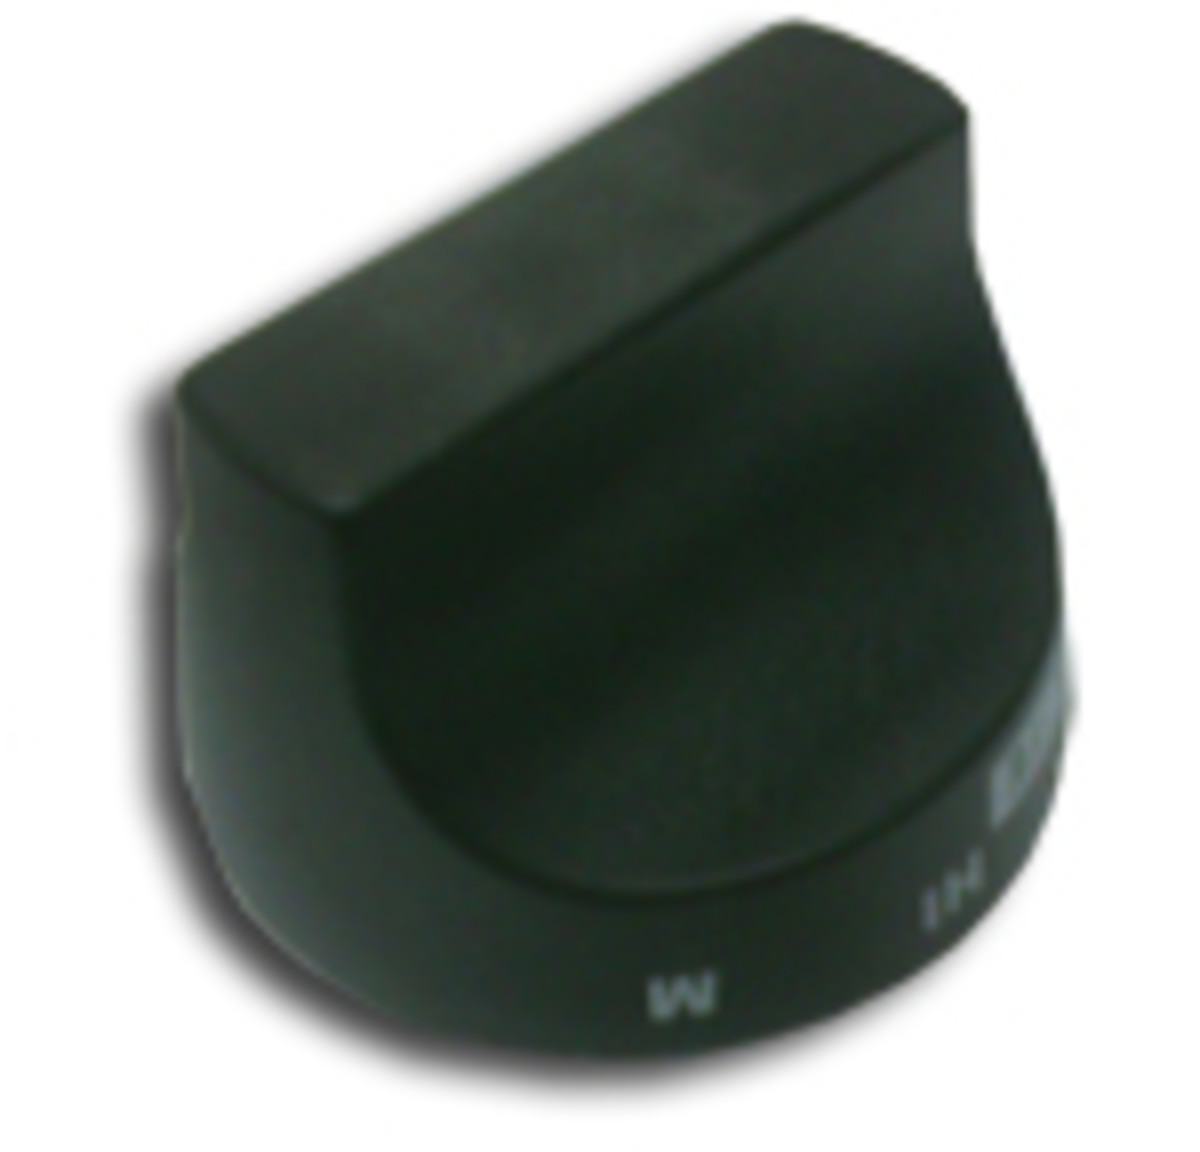 "older dcs control knob is 2.5"" diameter."